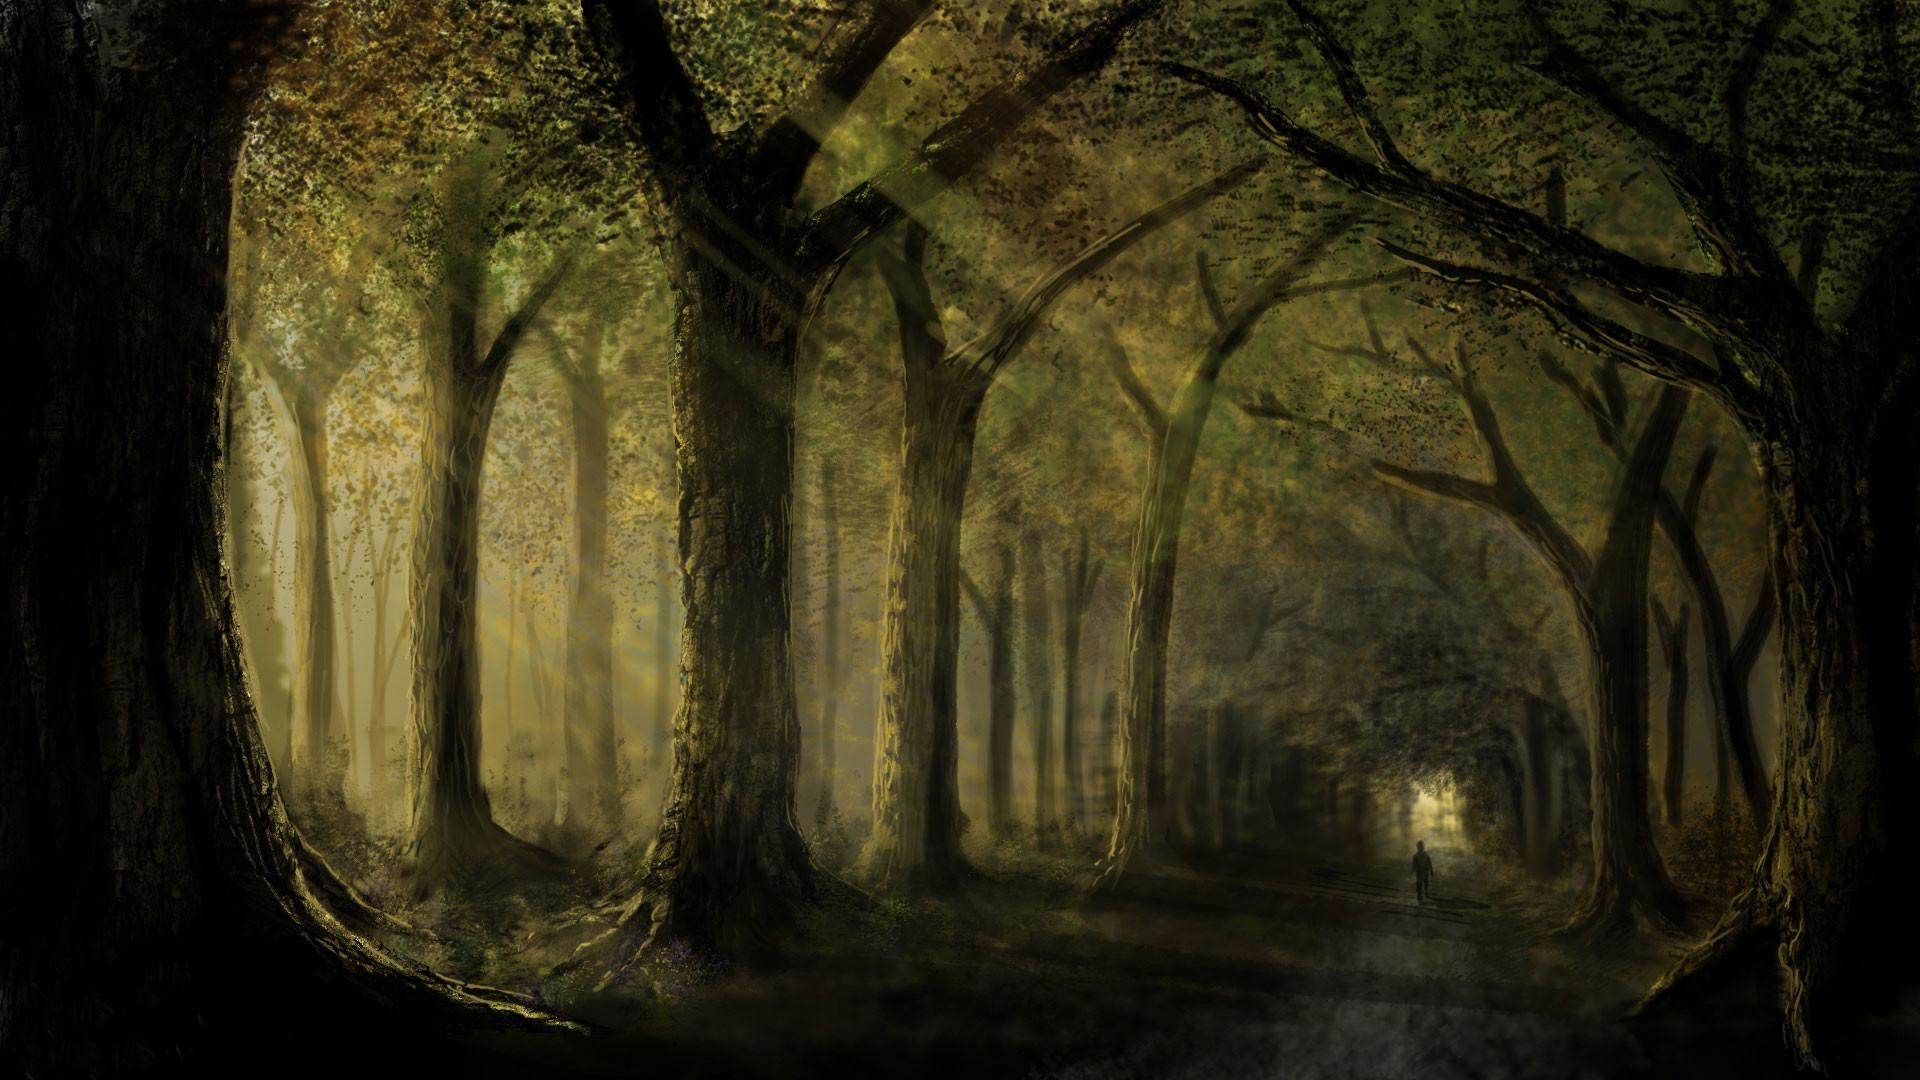 hd pics photos best dark nature trees woods horror forest path hd quality  desktop background wallpaper